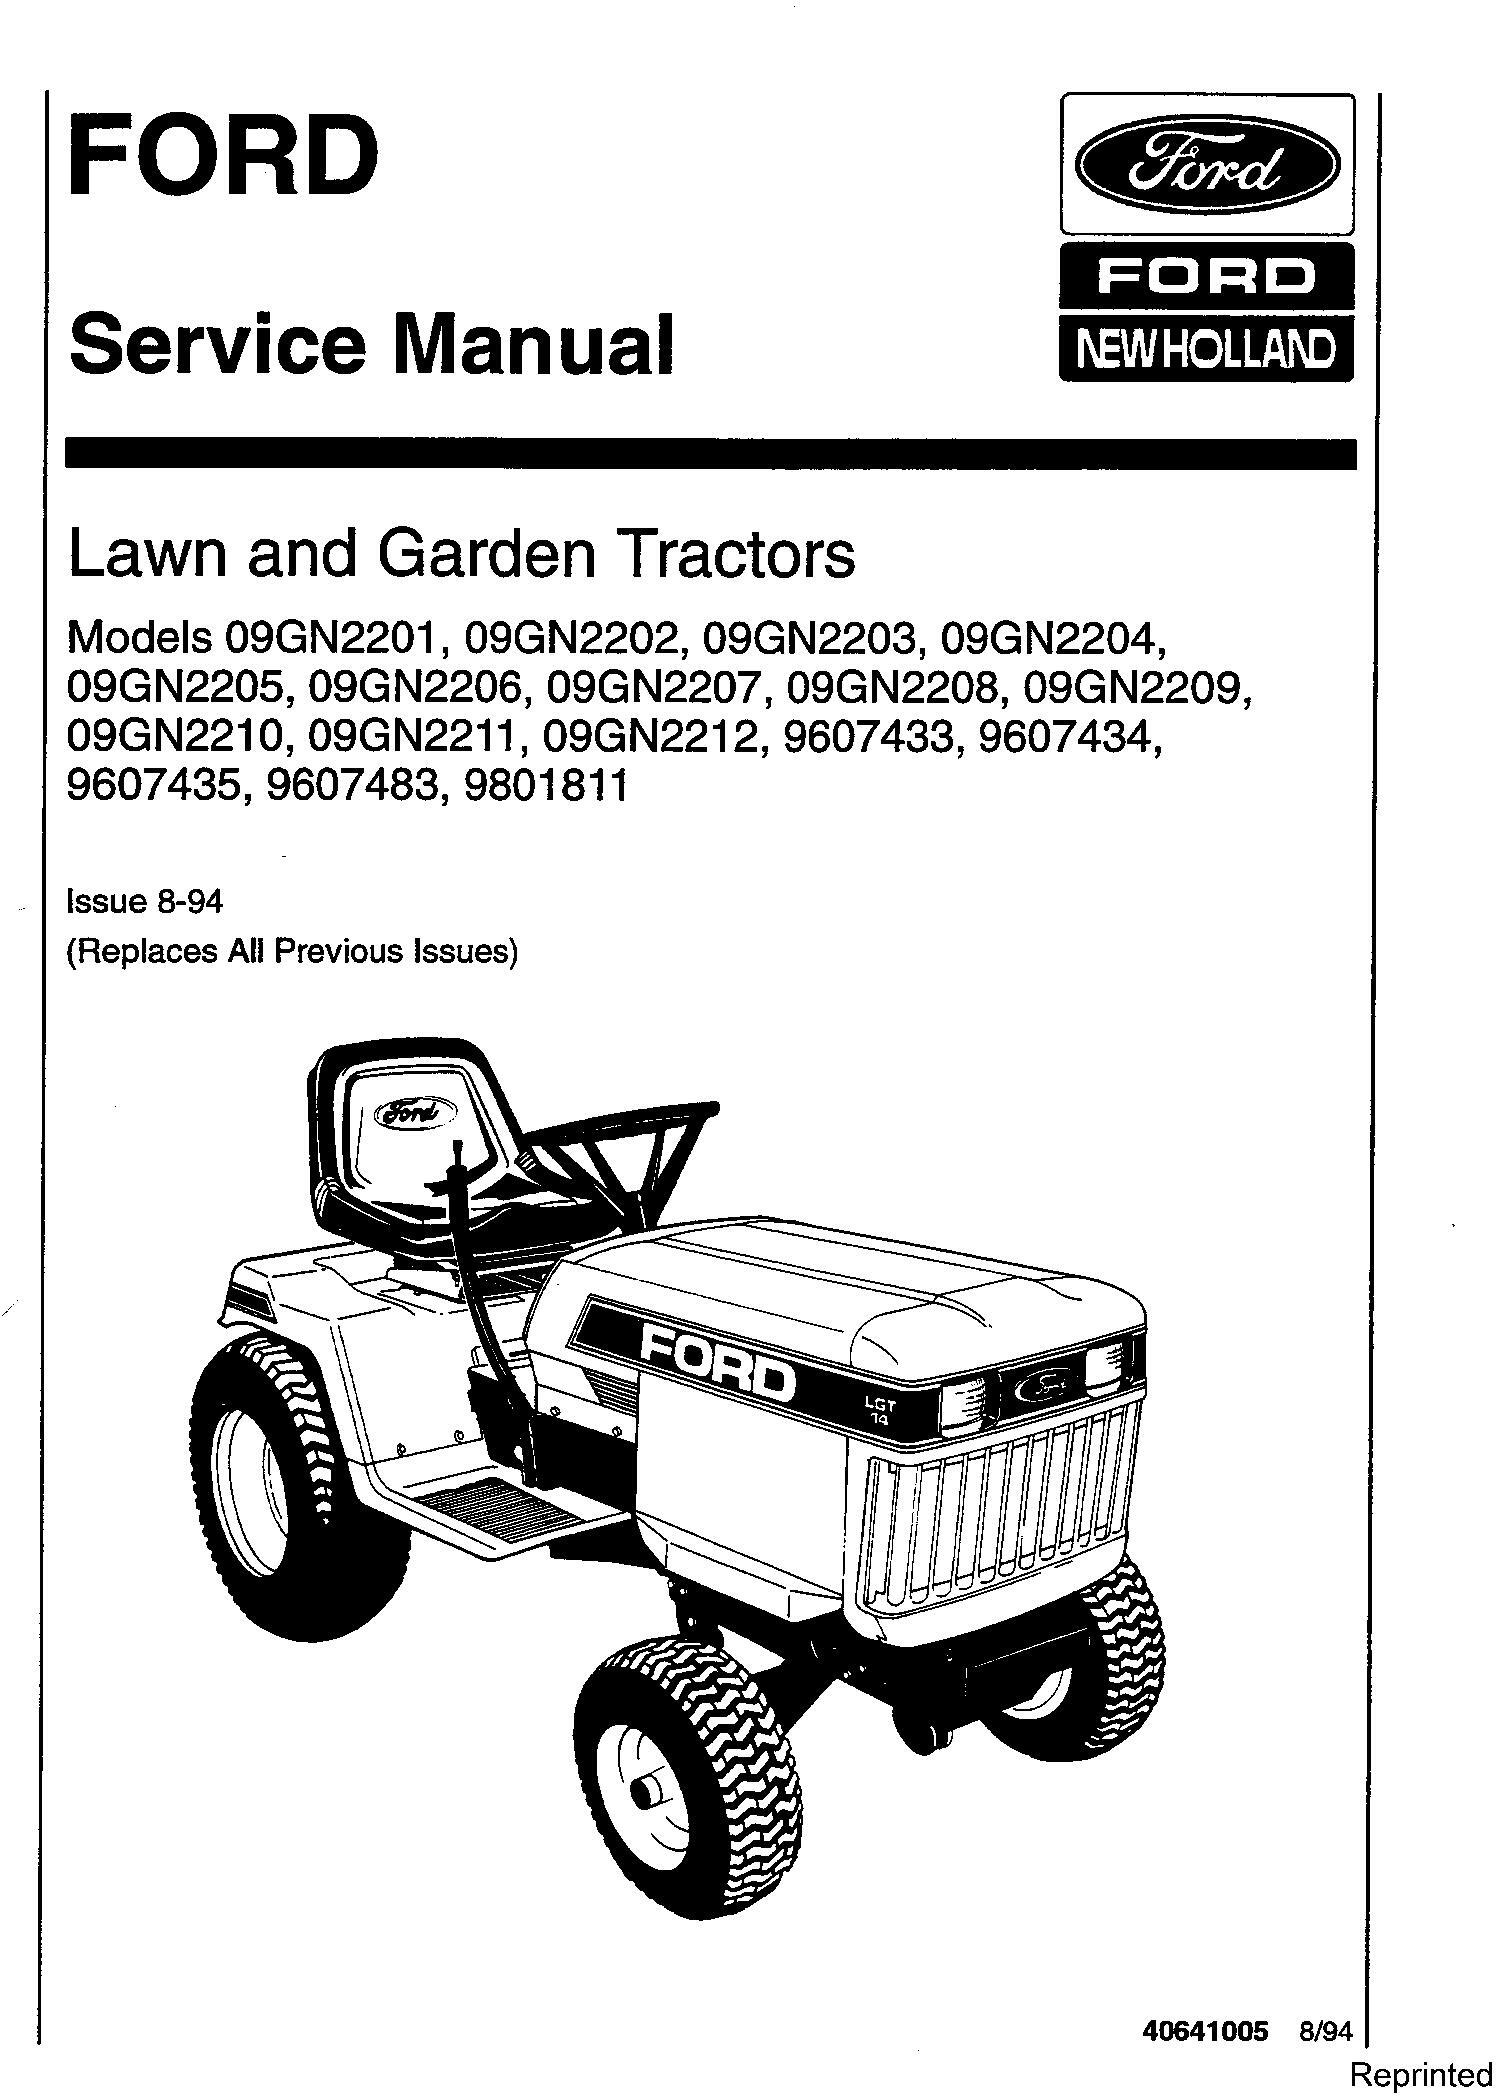 Ford LGT12 (H), LGT14 (H), LGT17 (H), LGT18H Lawn & Garden